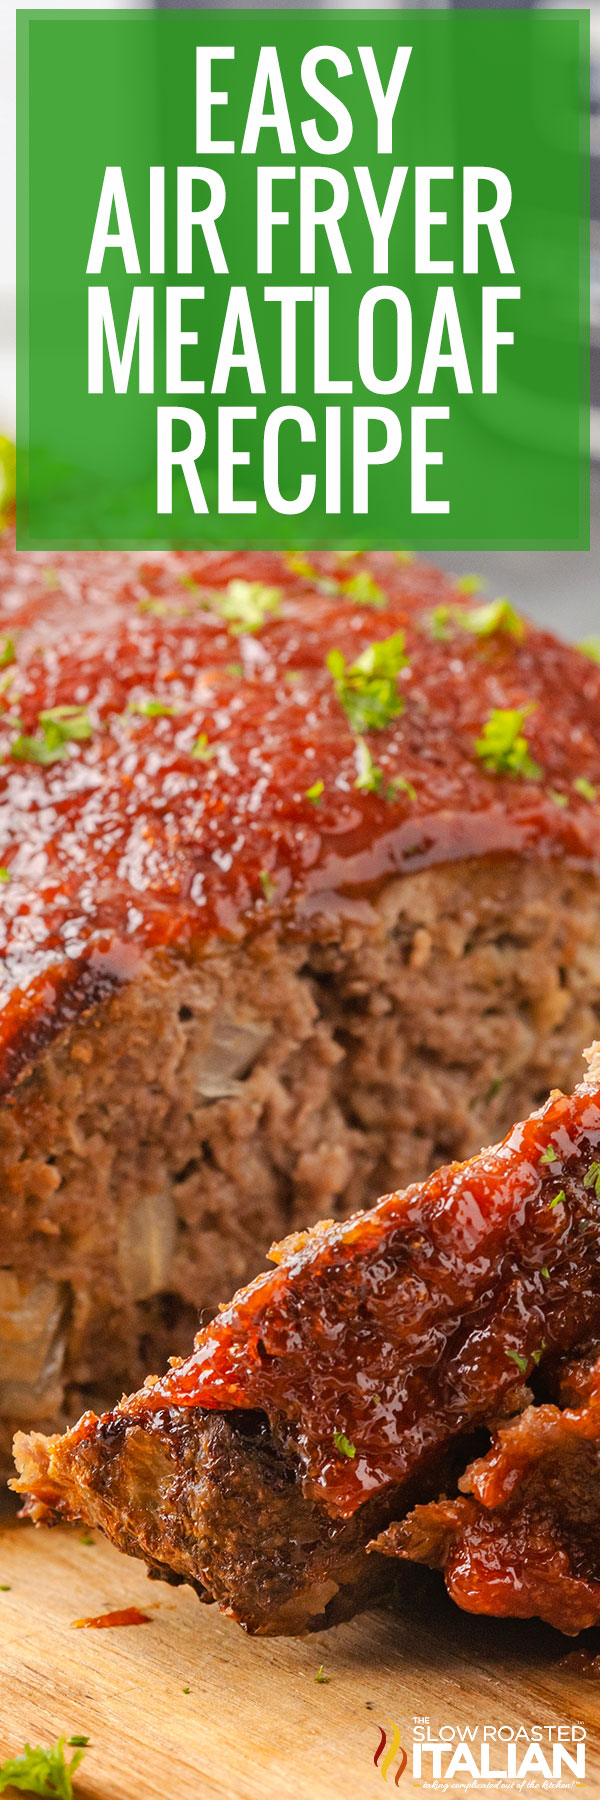 air fryer meatloaf closeup